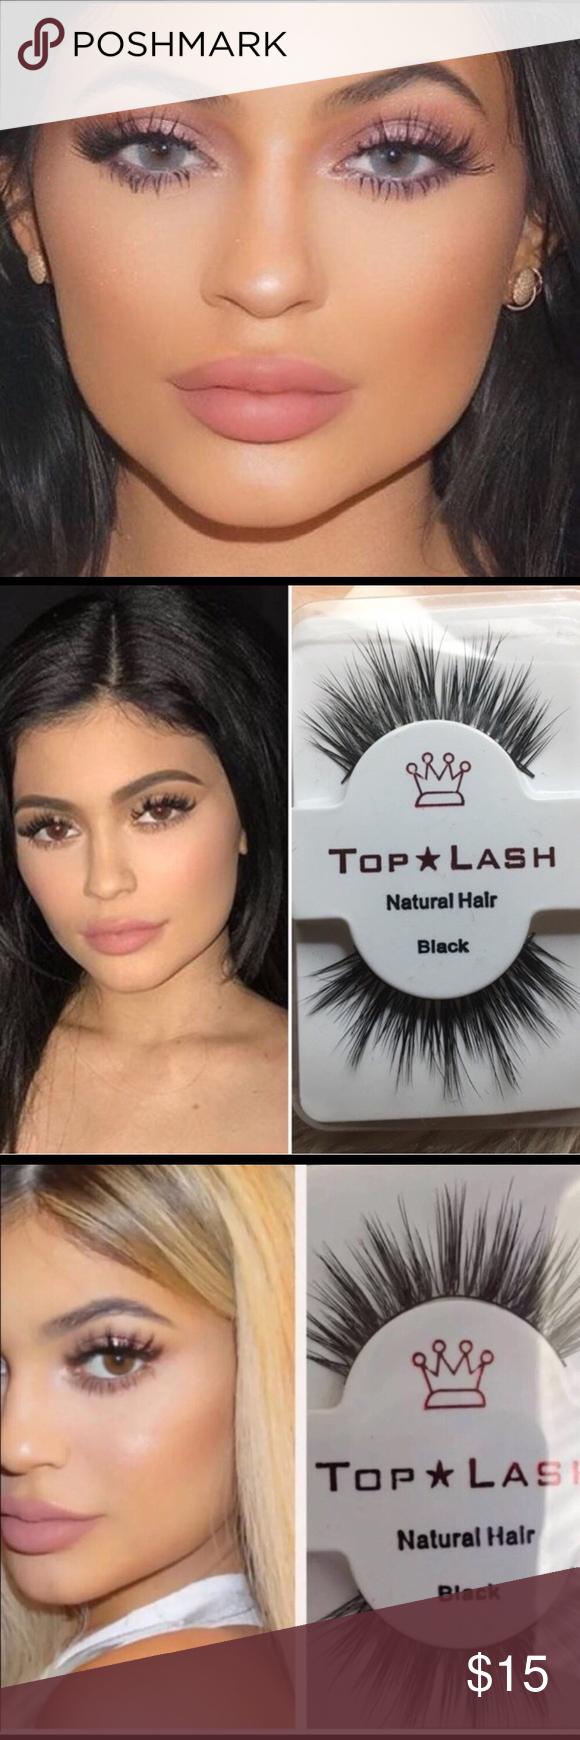 039f67d3201 5 Pairs Kylie Jenner Top Lash Eyelashes 5 pairs of our Kylie Jenner Top  Lashes 5 star rated ✨ Sephora Makeup False Eyelashes